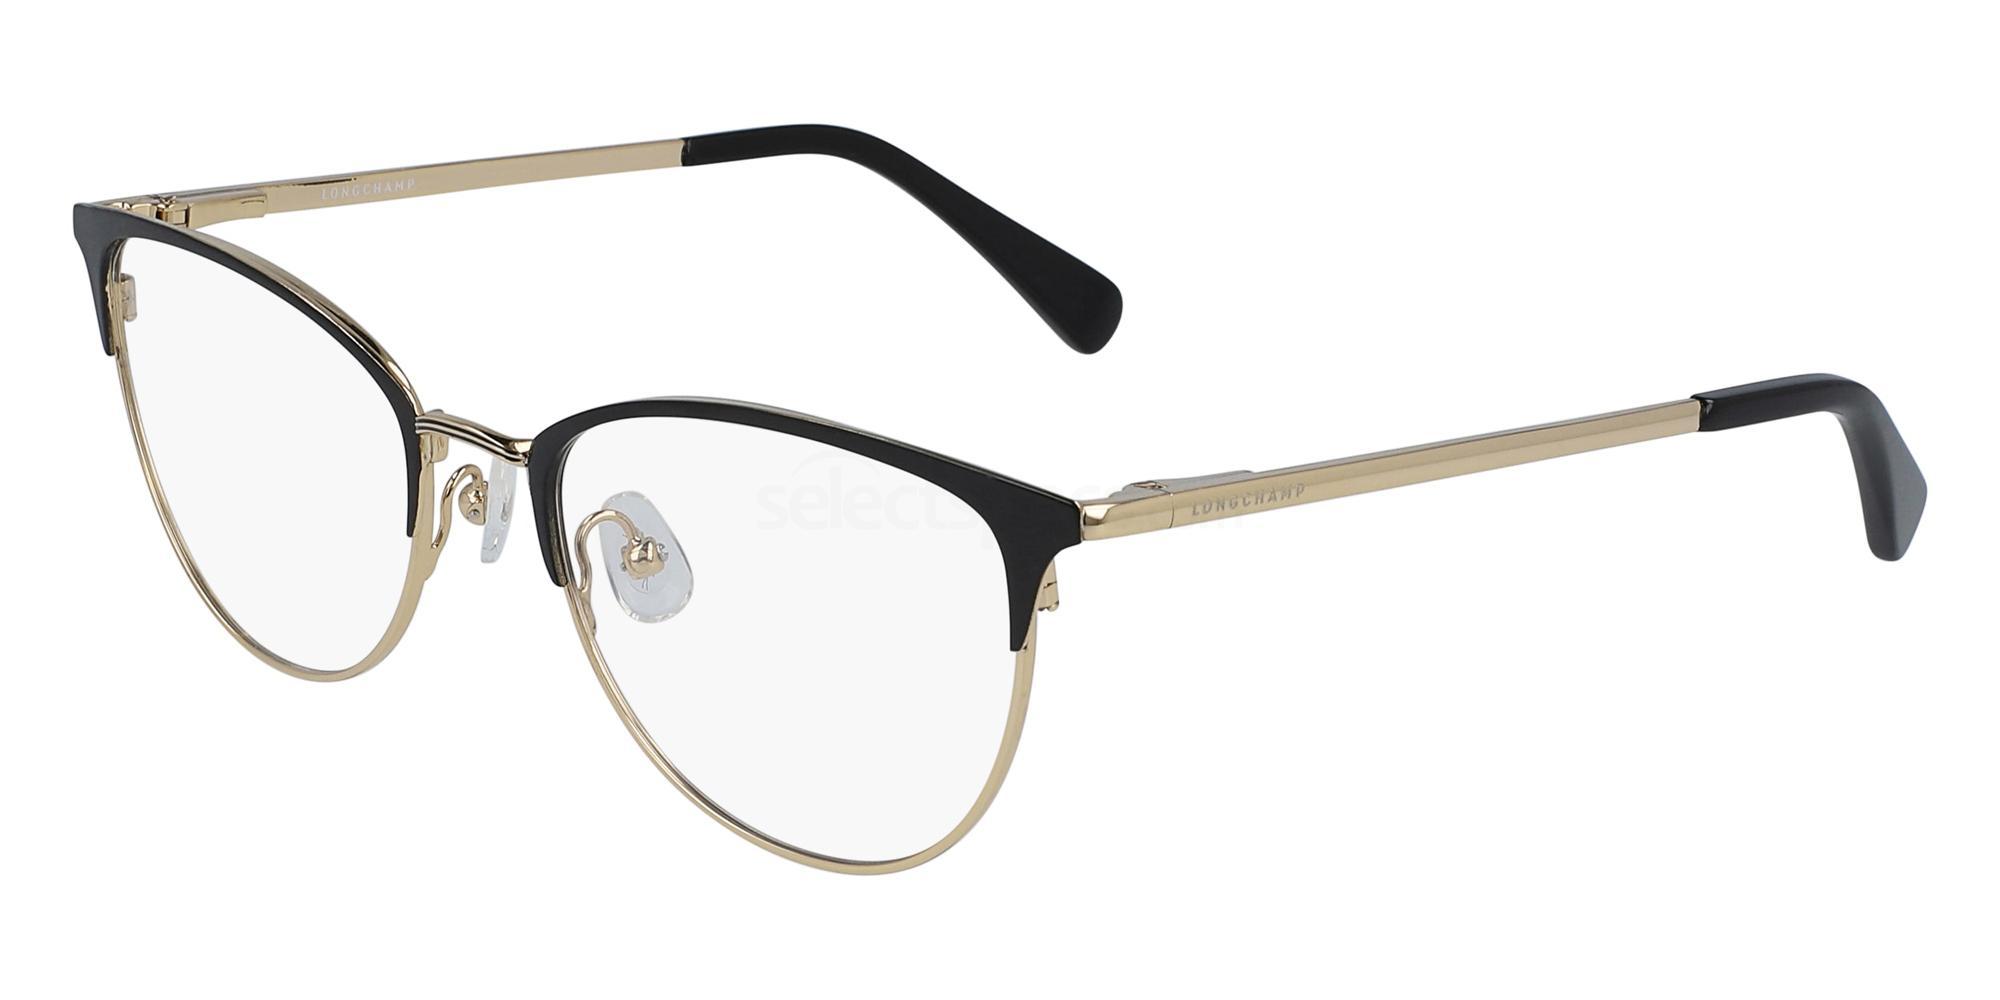 001 LO2120 Glasses, LONGCHAMP